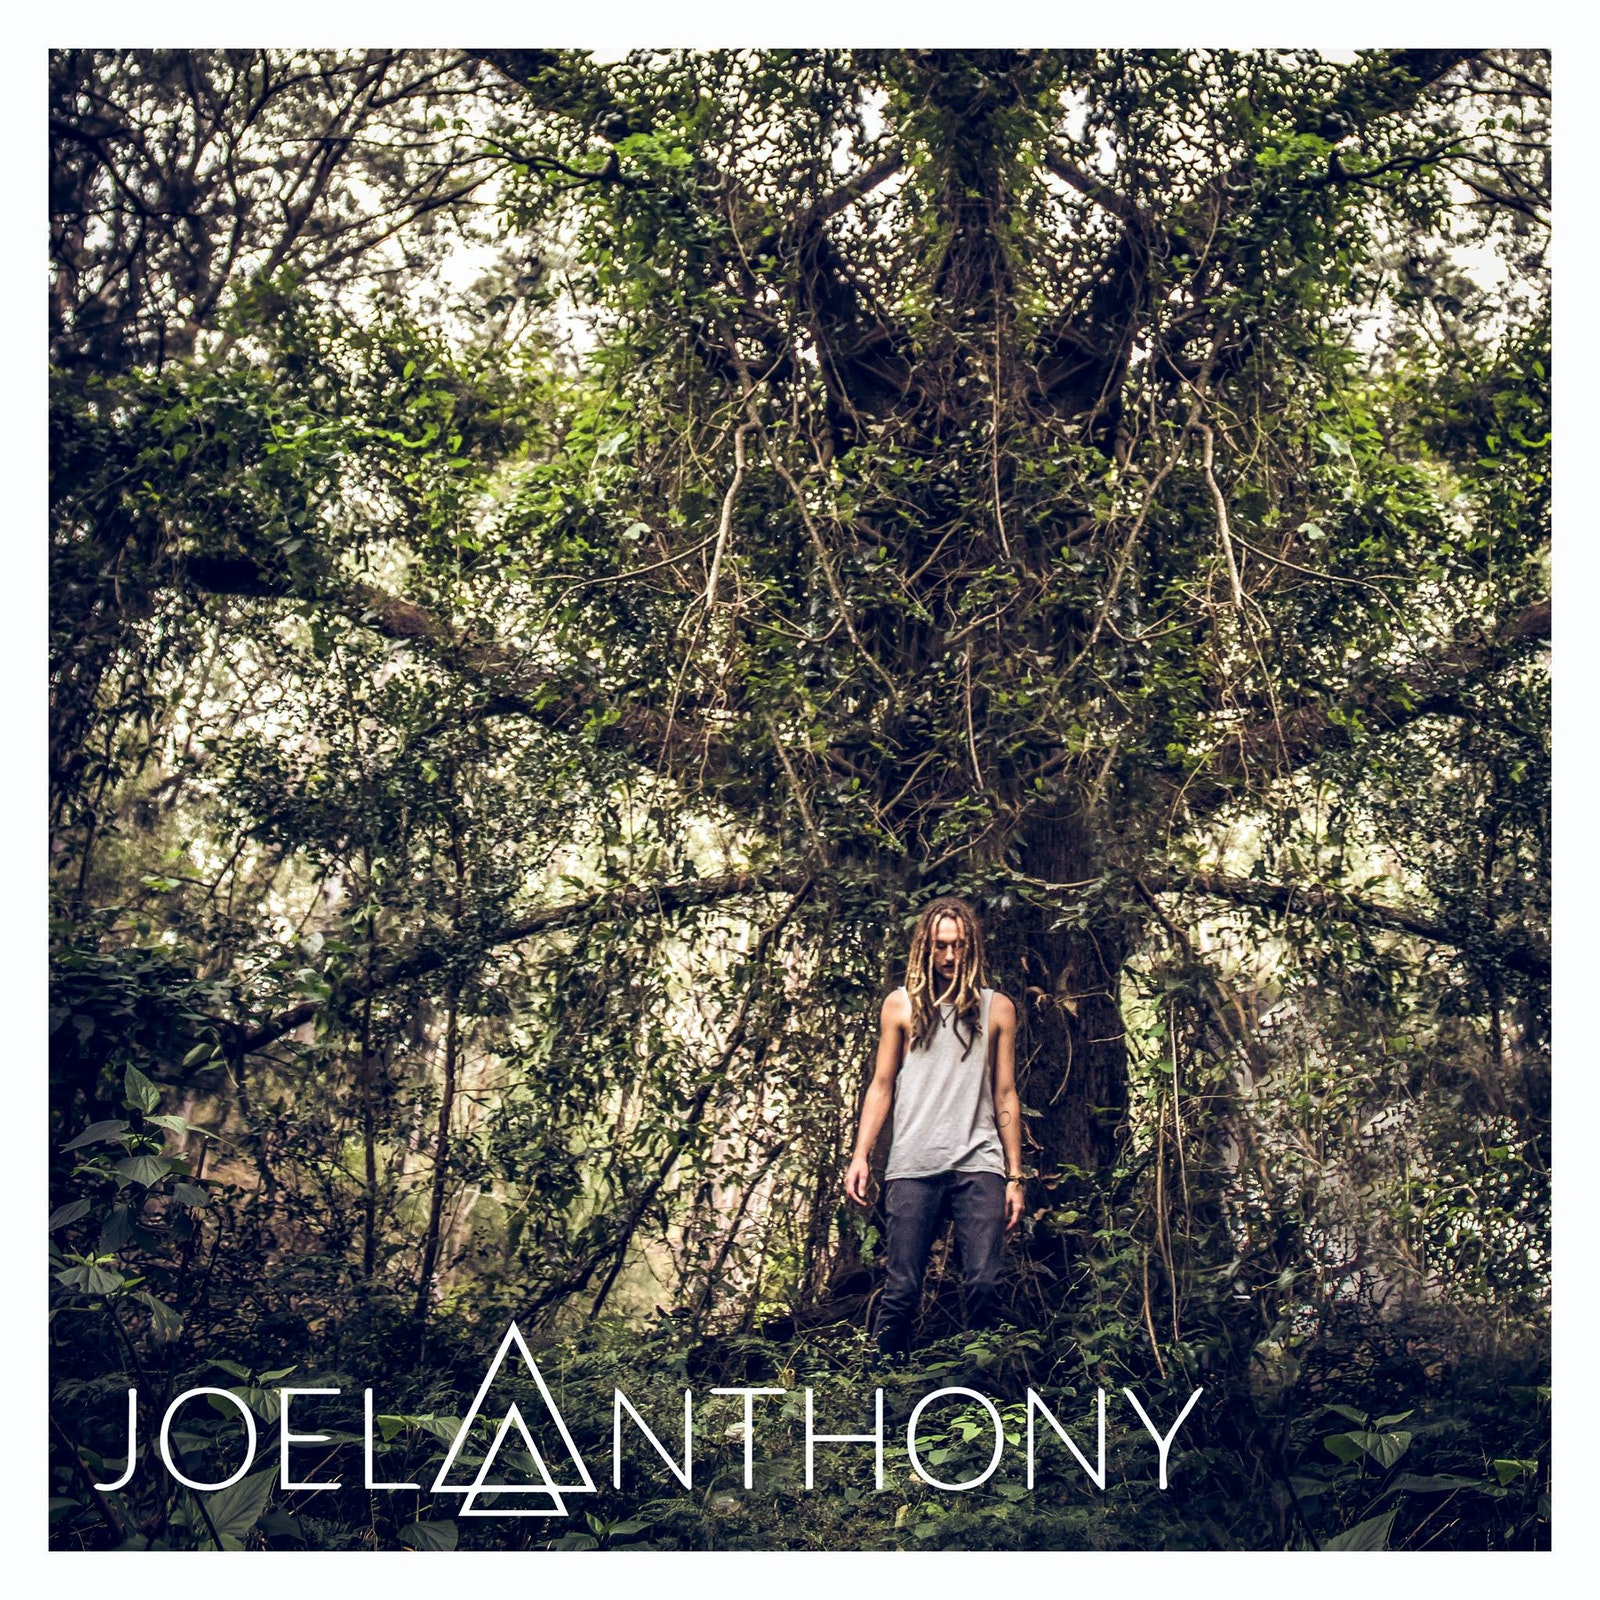 Joel Anthony visual branding by Storm Lahiff